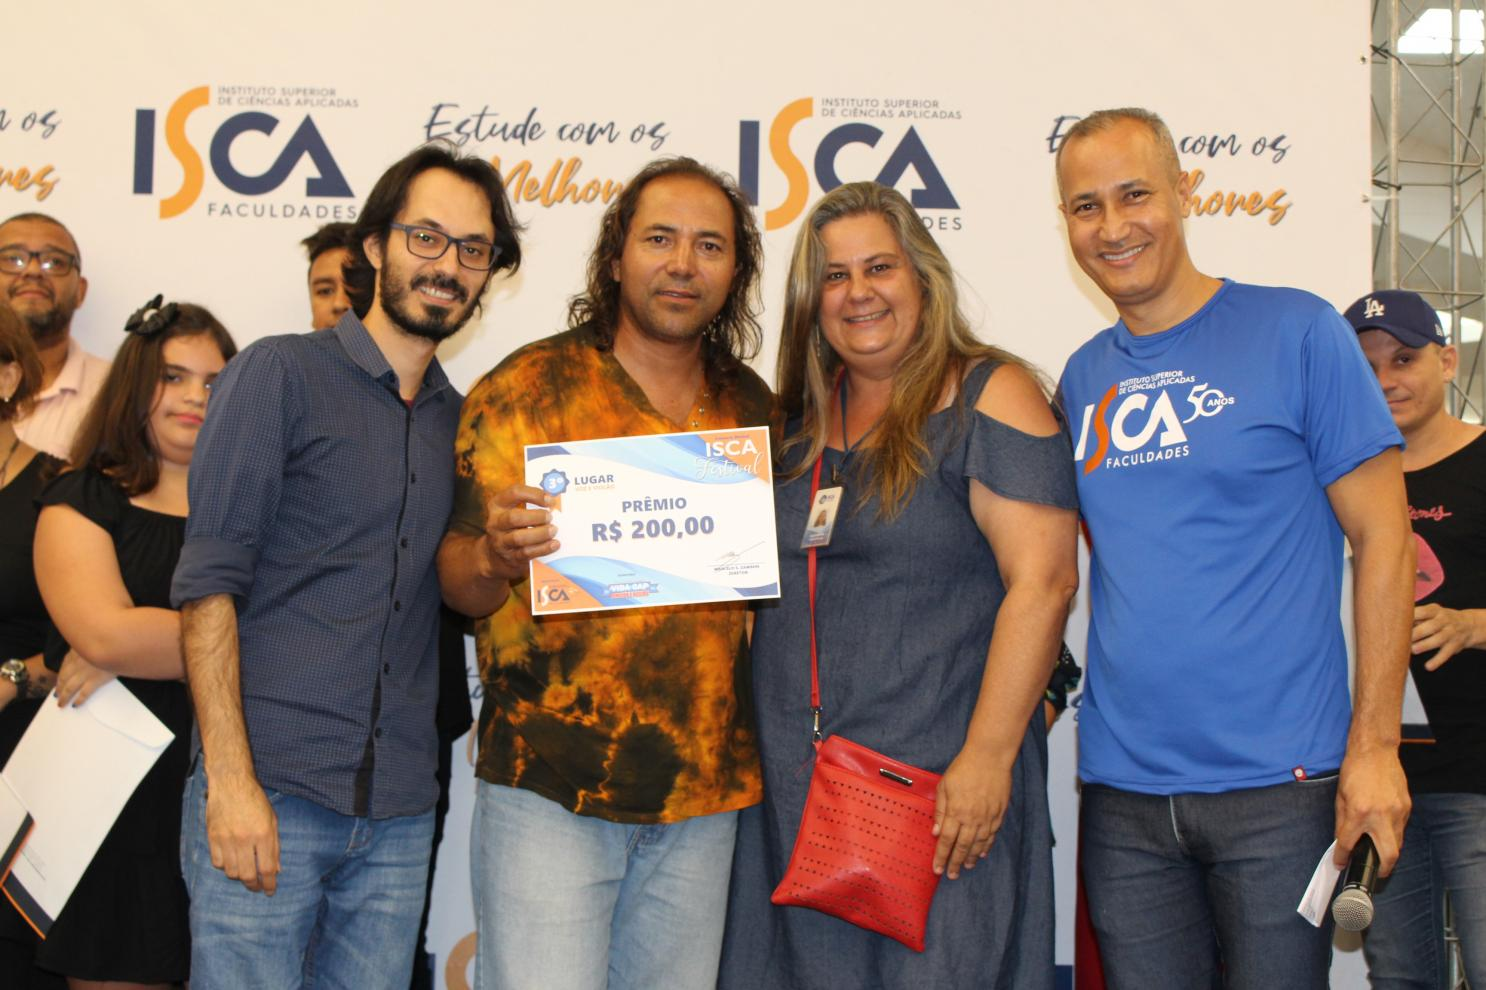 Premiados os finalistas no concurso musical ISCA Festival